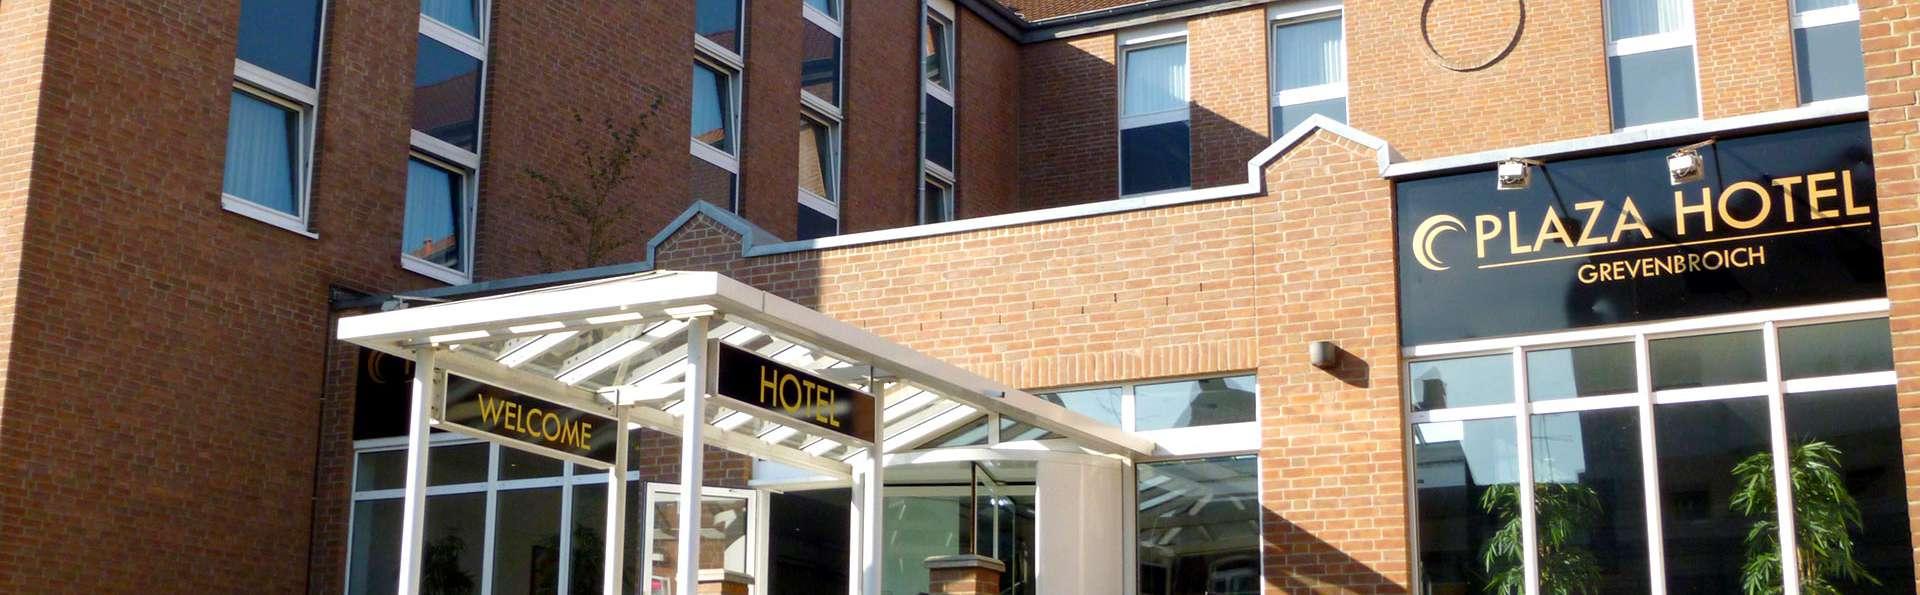 Best Western Plaza Hotel Grevenbroich - Edit_Front.jpg